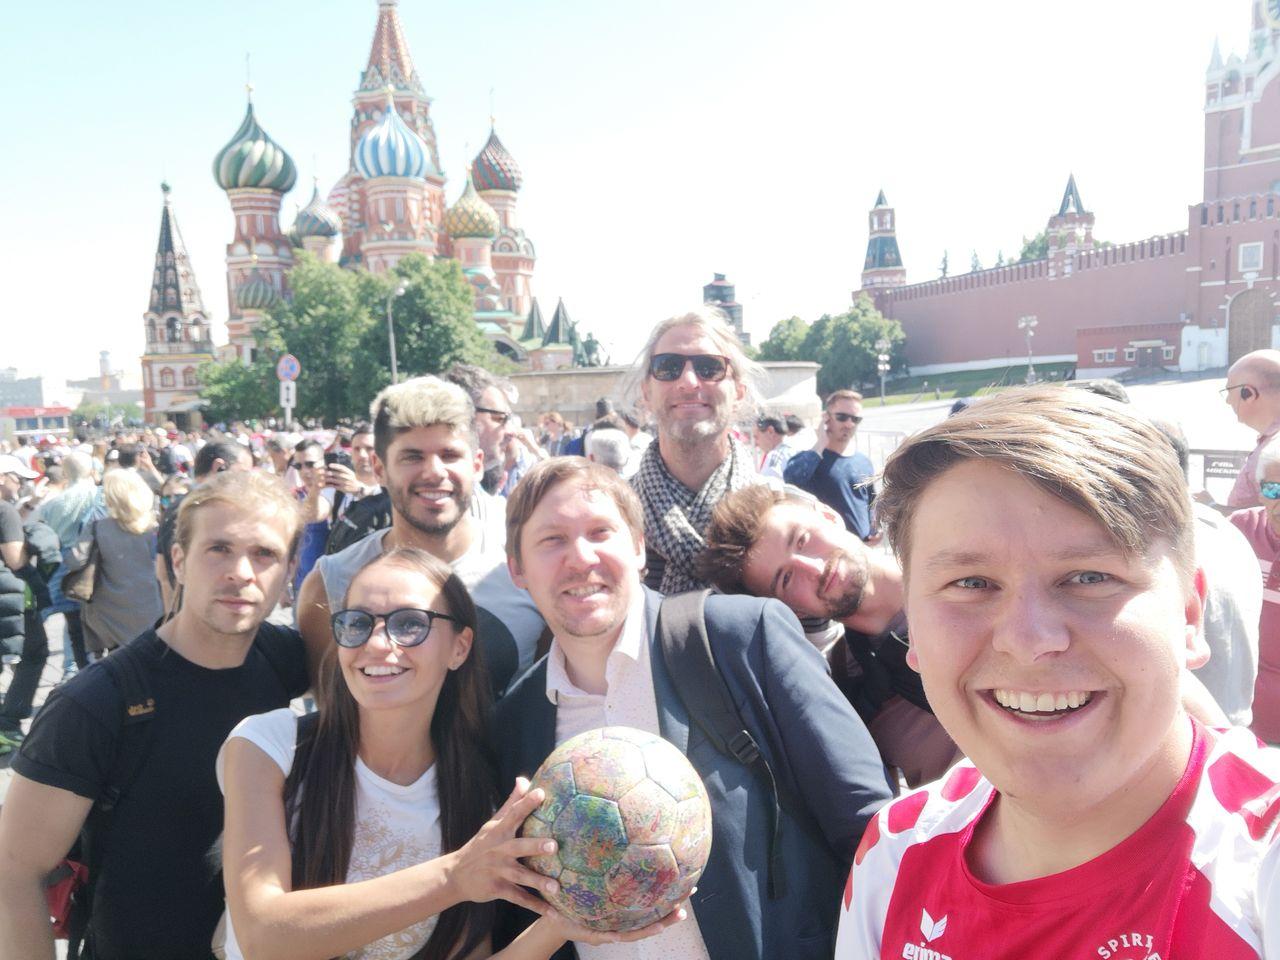 Das Moskau Team: Martin. Anastasia. Joaquin, Konstantin, Andrew, Benny, Benni